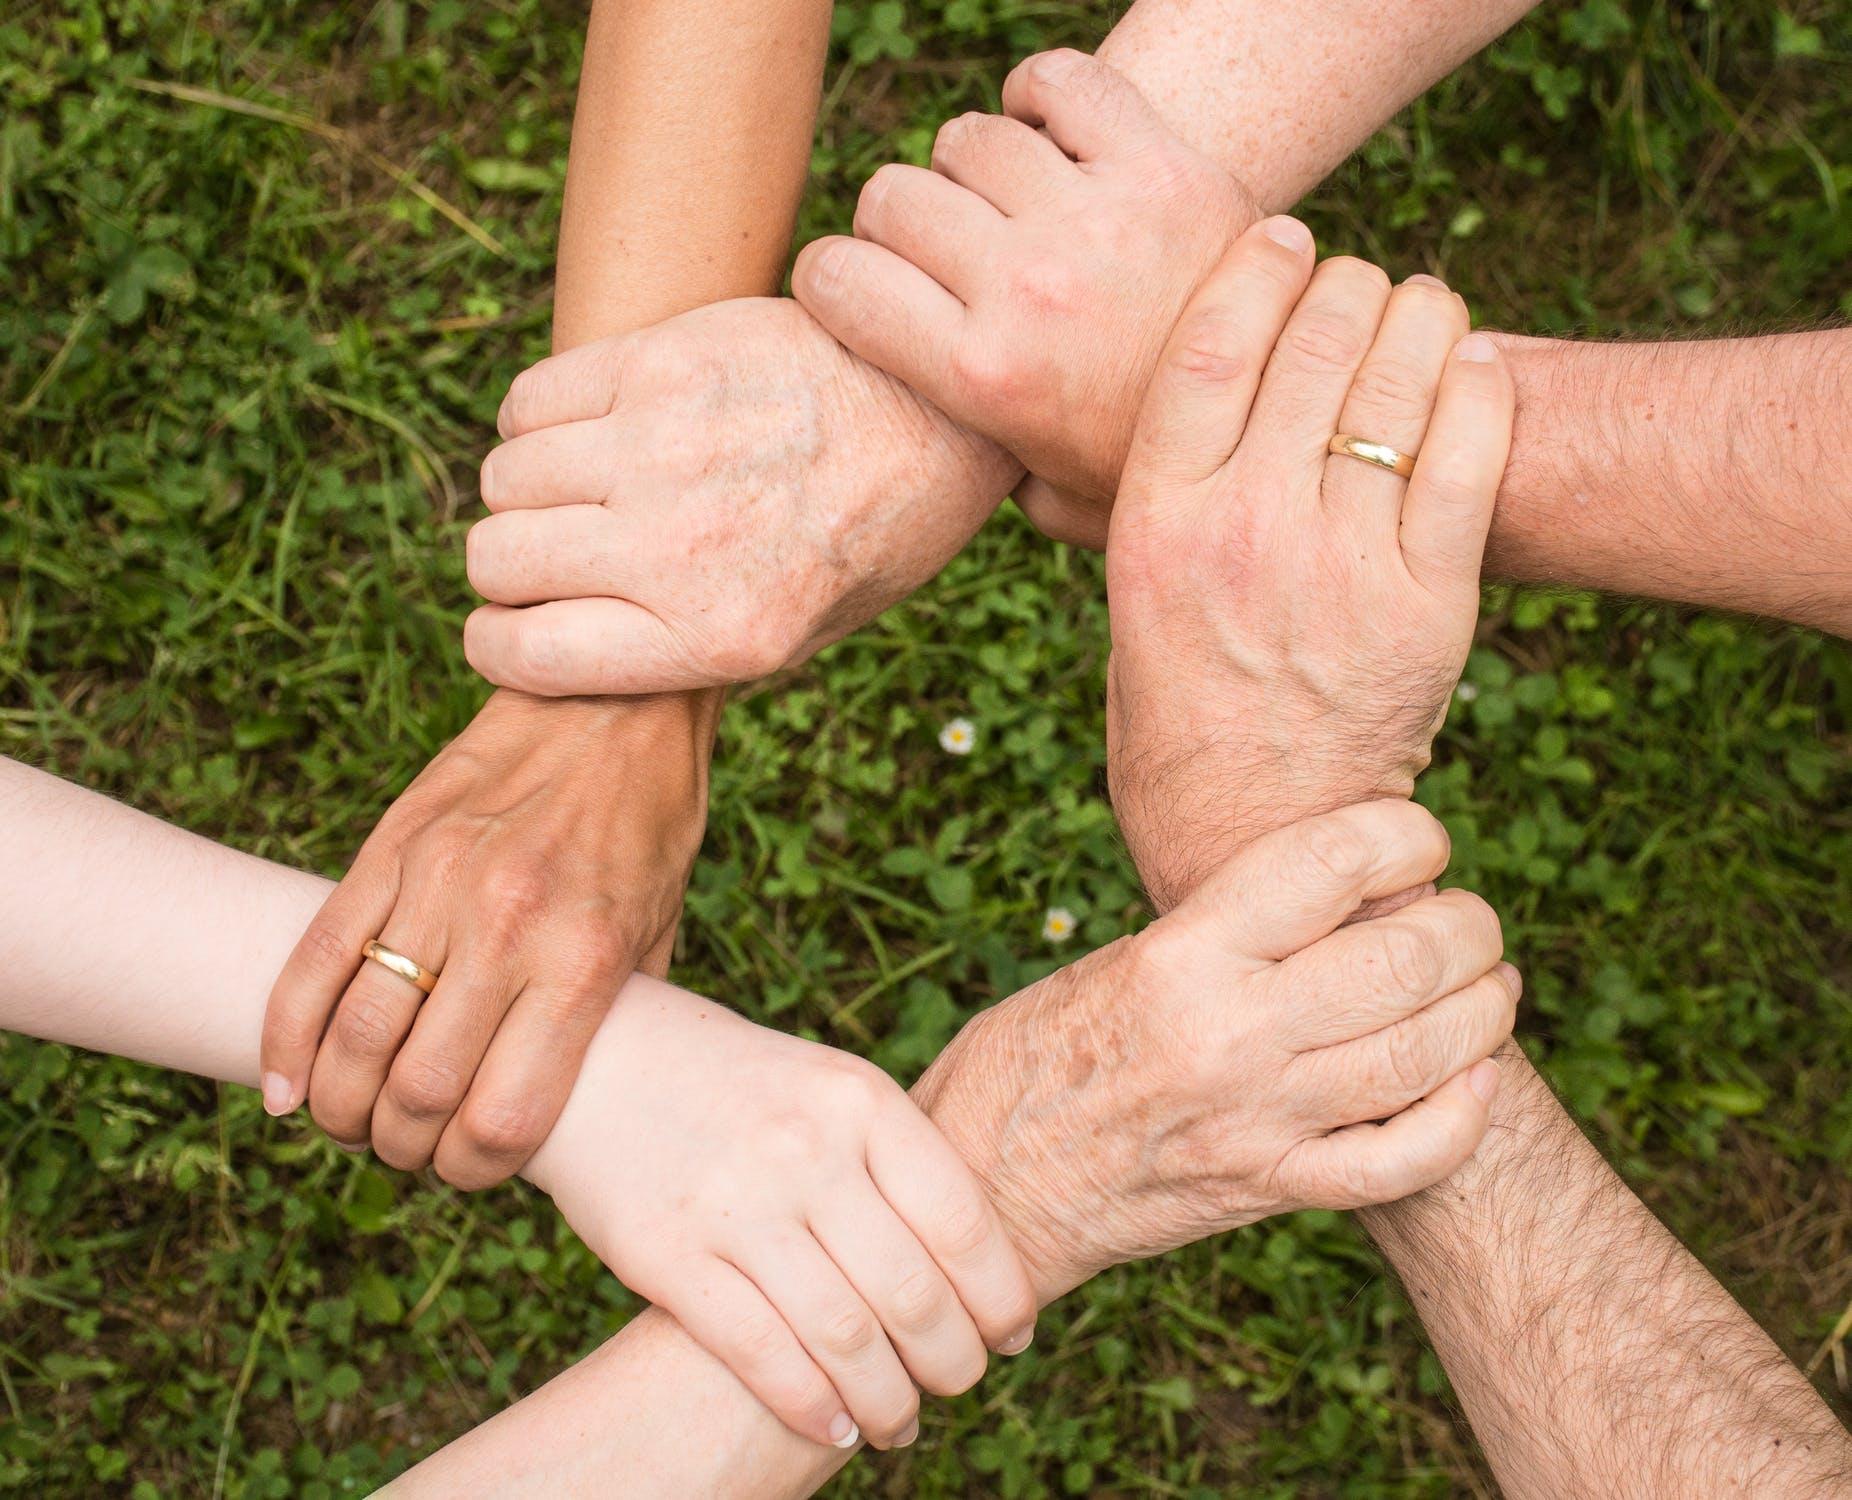 Folk holder fat i andres håndled